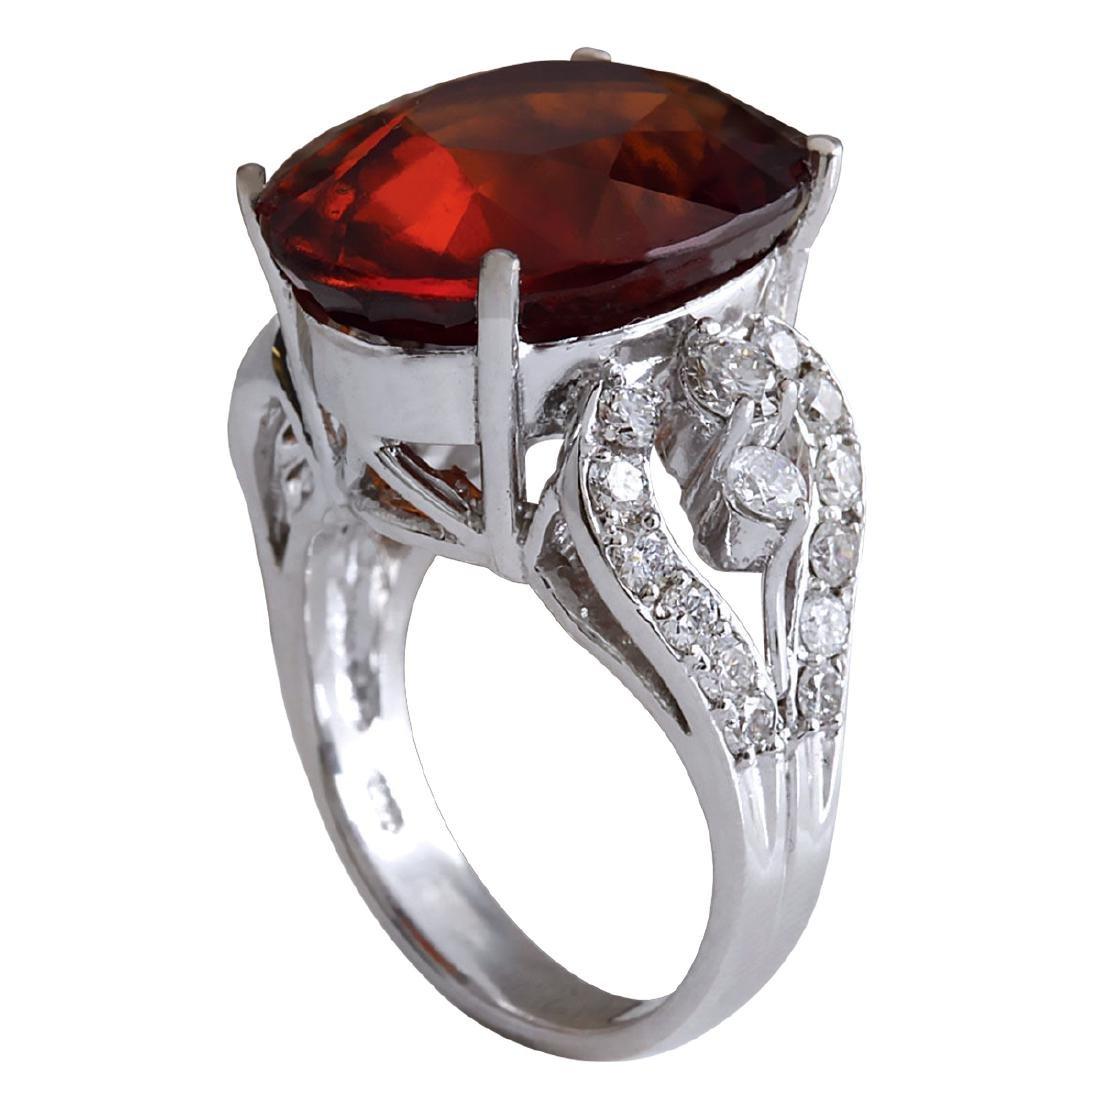 19.81Ct Natural Red Hessonite Garnet And Diamond Ring - 3